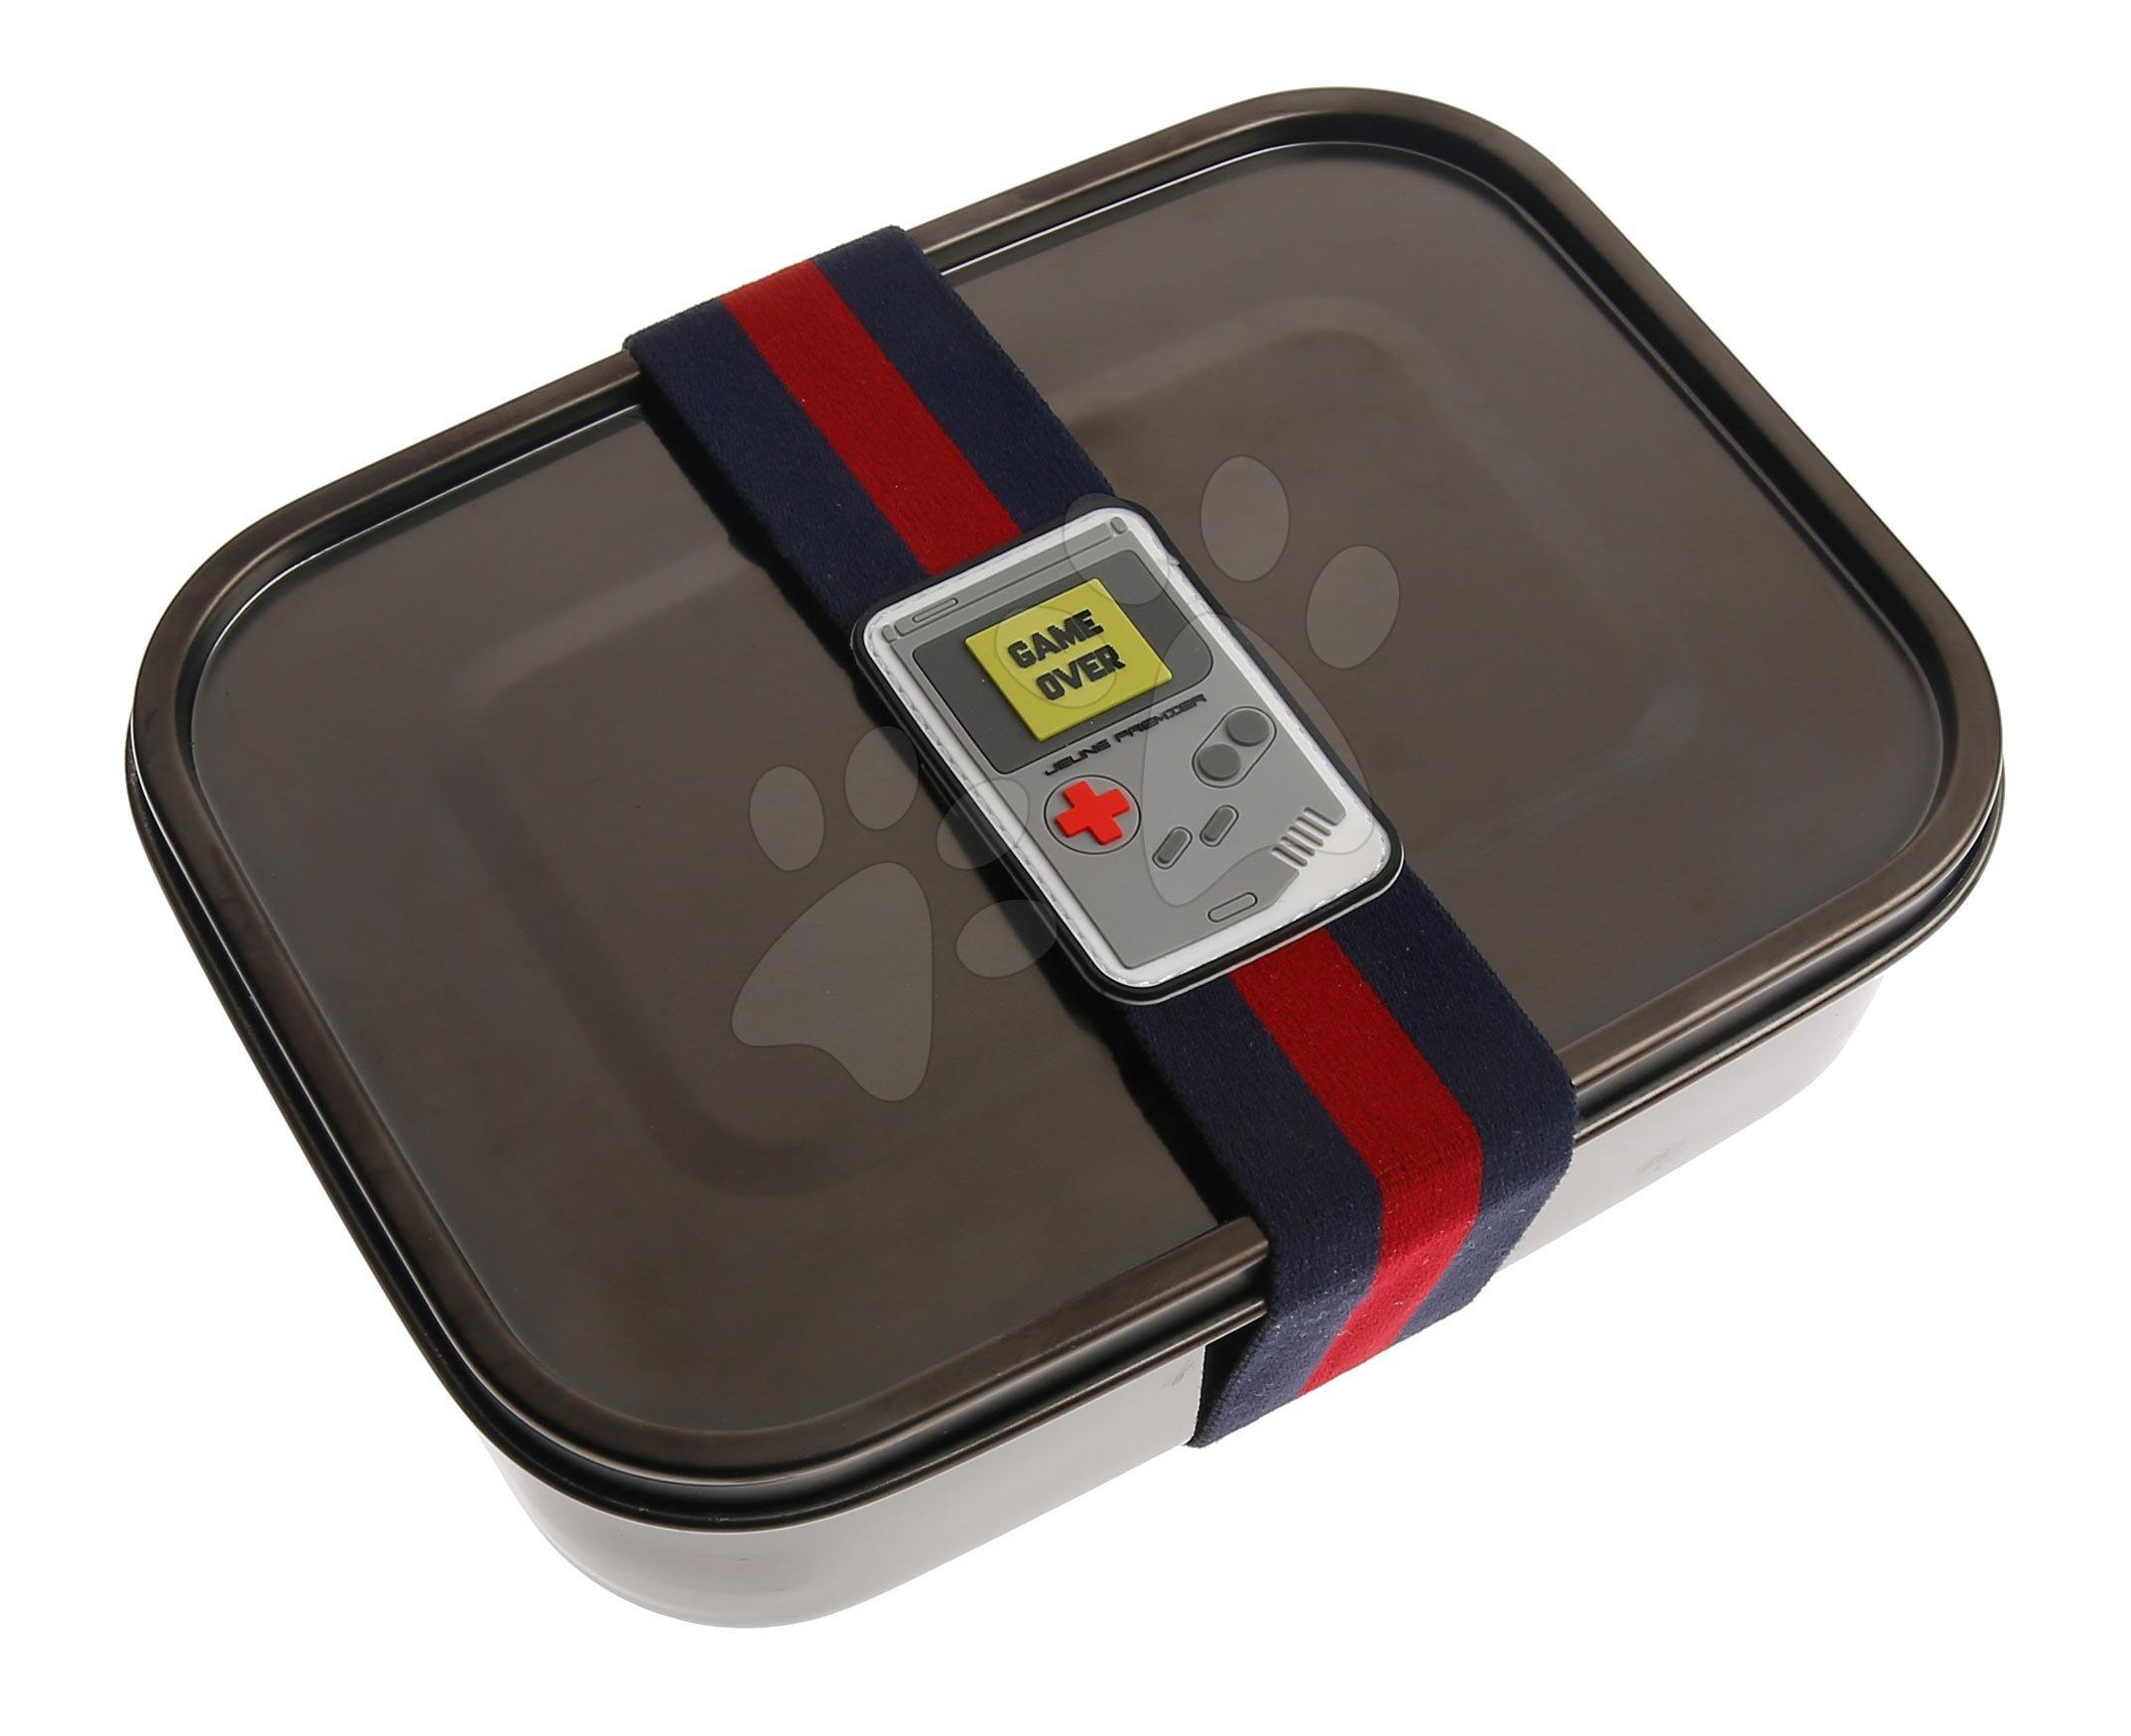 Box na desiatu Stainless Steel Lunchbox Boys Black Nickel Mr. Gadget Jeune Premier 100% nehrdzavejúca oceľ luxusné prevedenie 21*7 cm